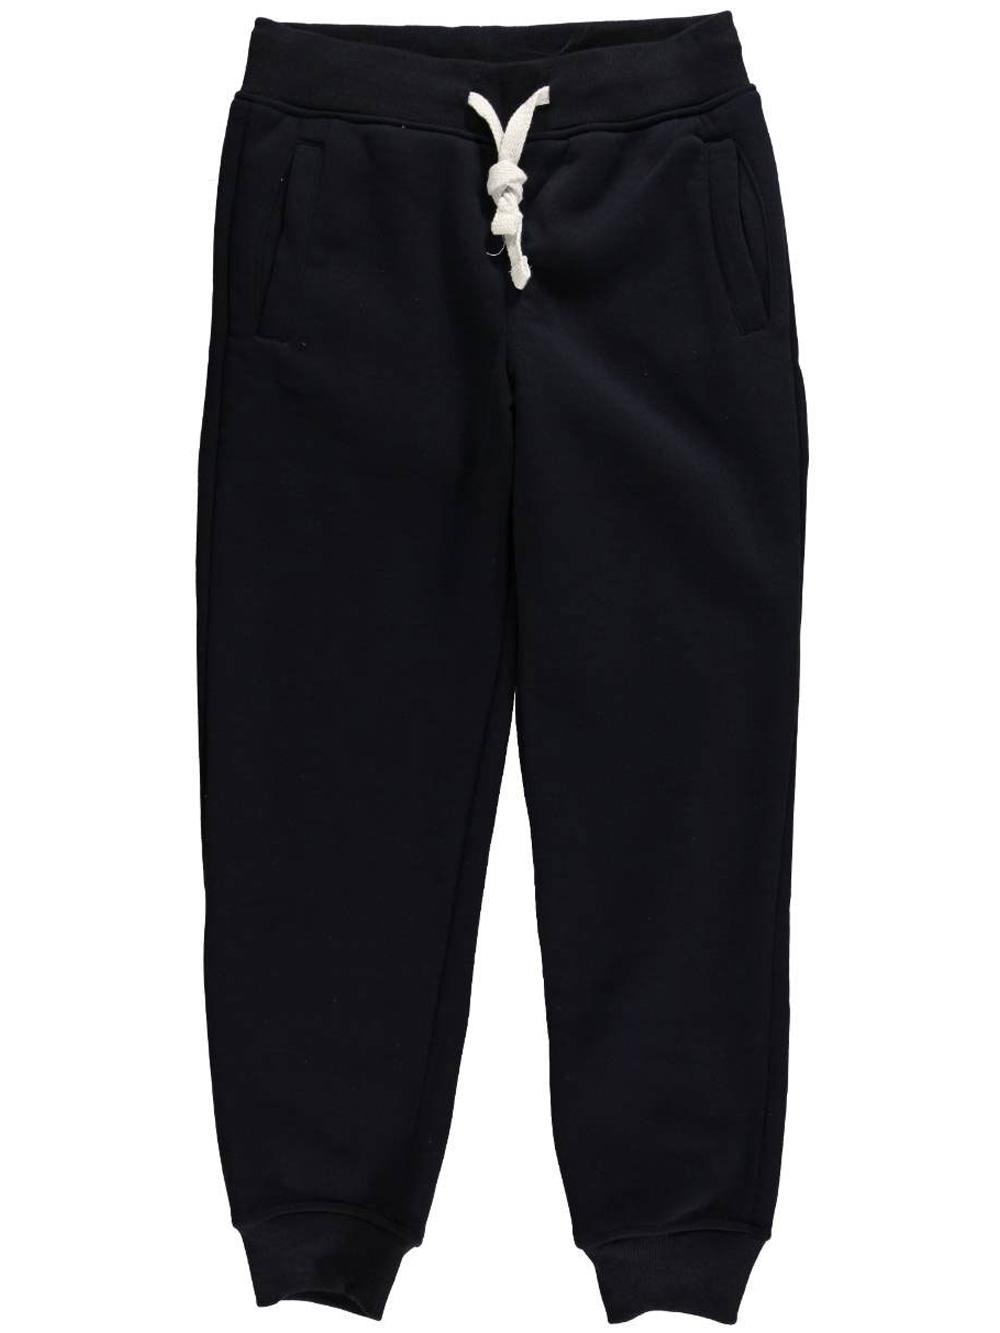 Image of SP Active Big Boys Jogger Sweatpants Sizes 8  20